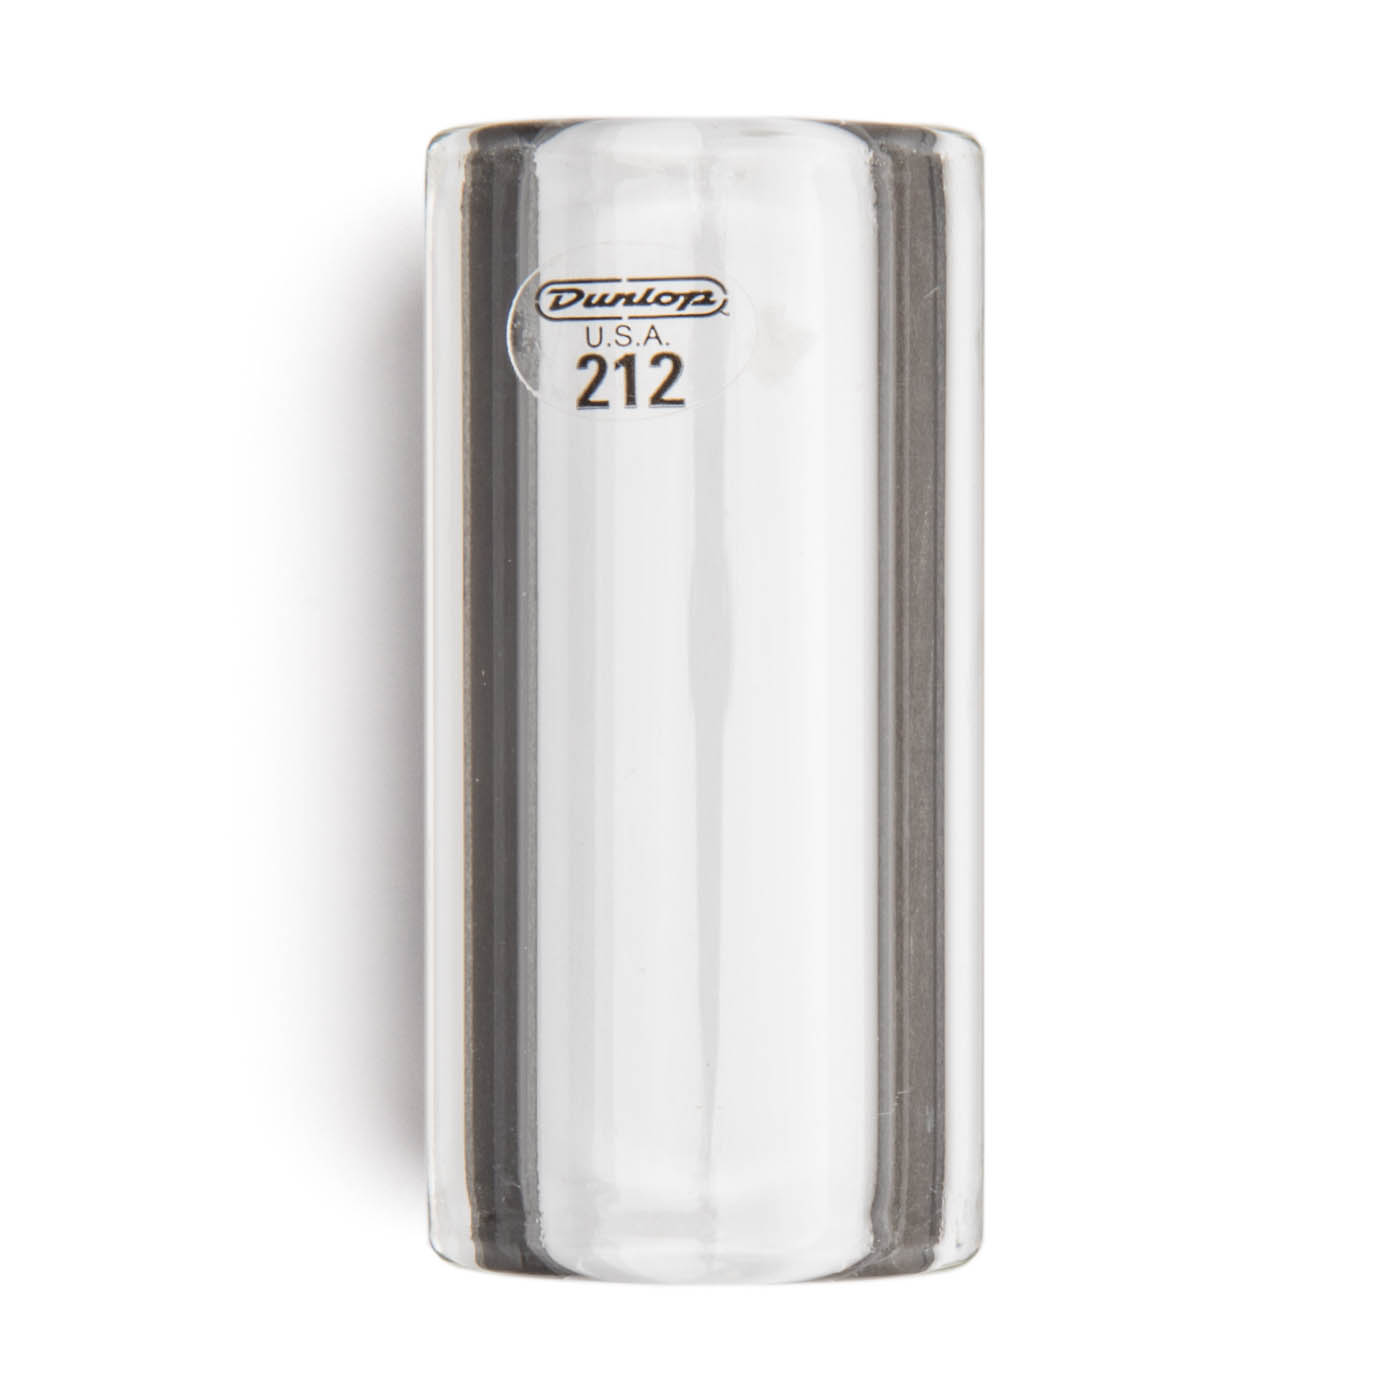 Pyrex Glass Slide 212